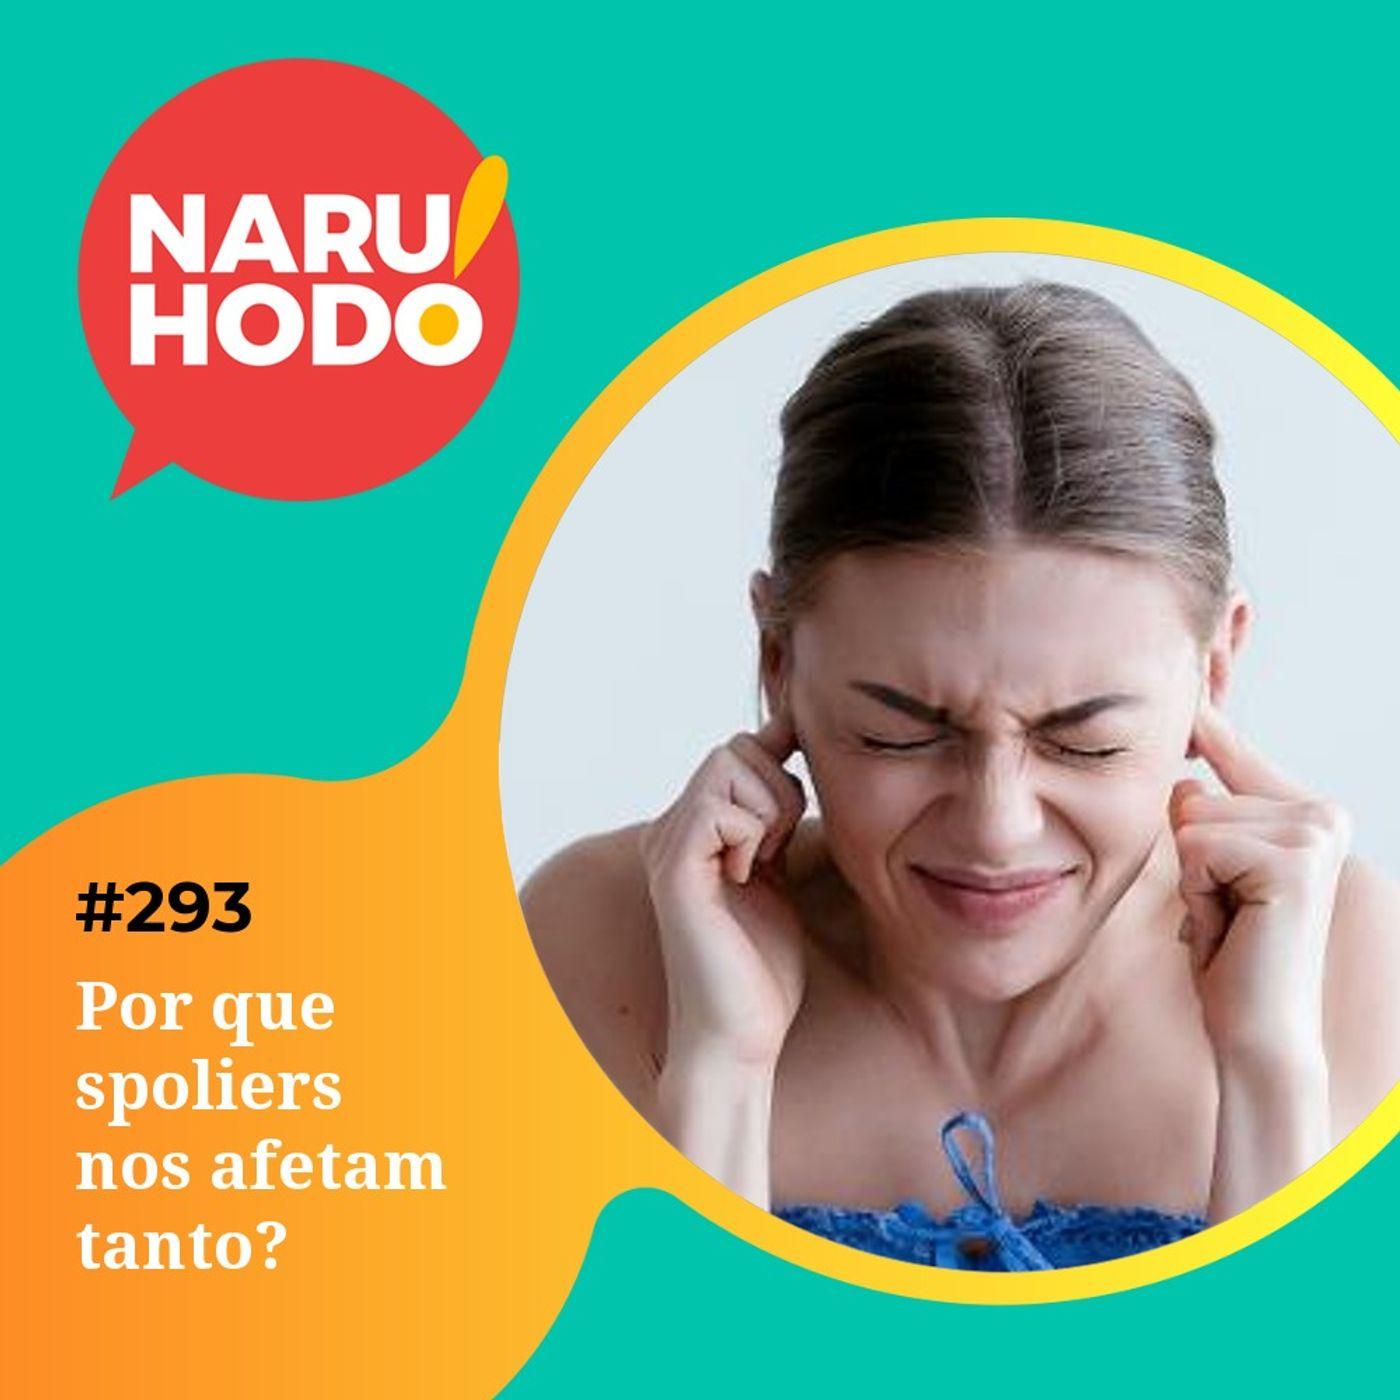 Naruhodo #293 - Por que spoilers nos afetam tanto?